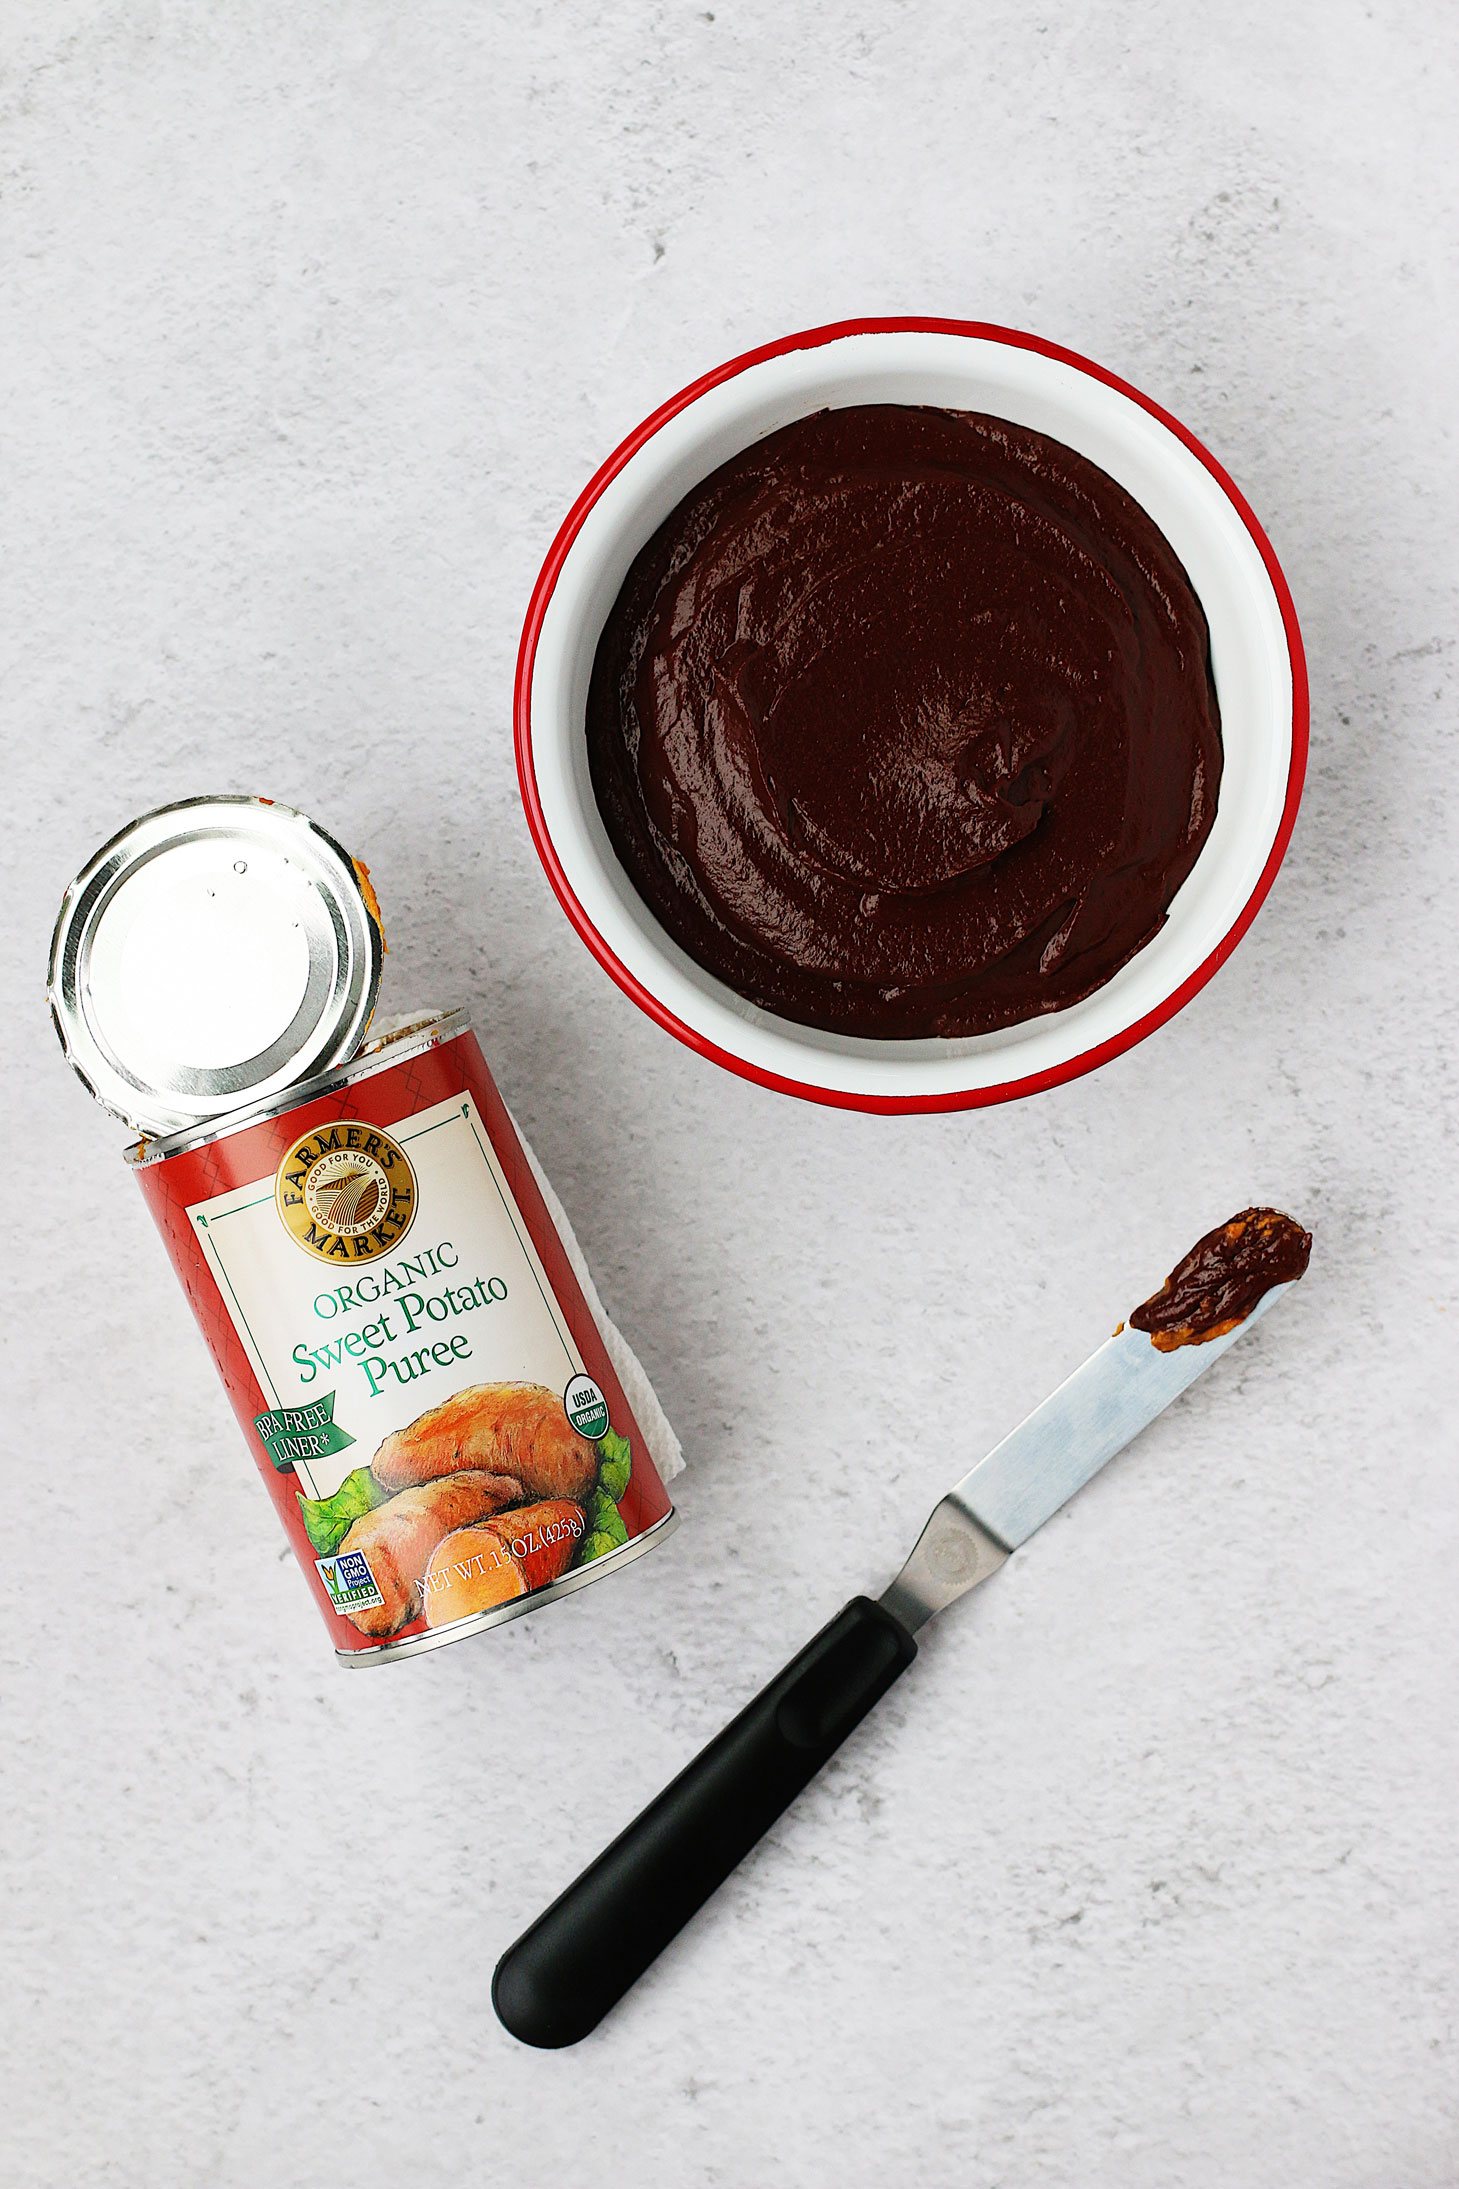 f52-genius-dessert-sweet-potato-chocolate-frosting